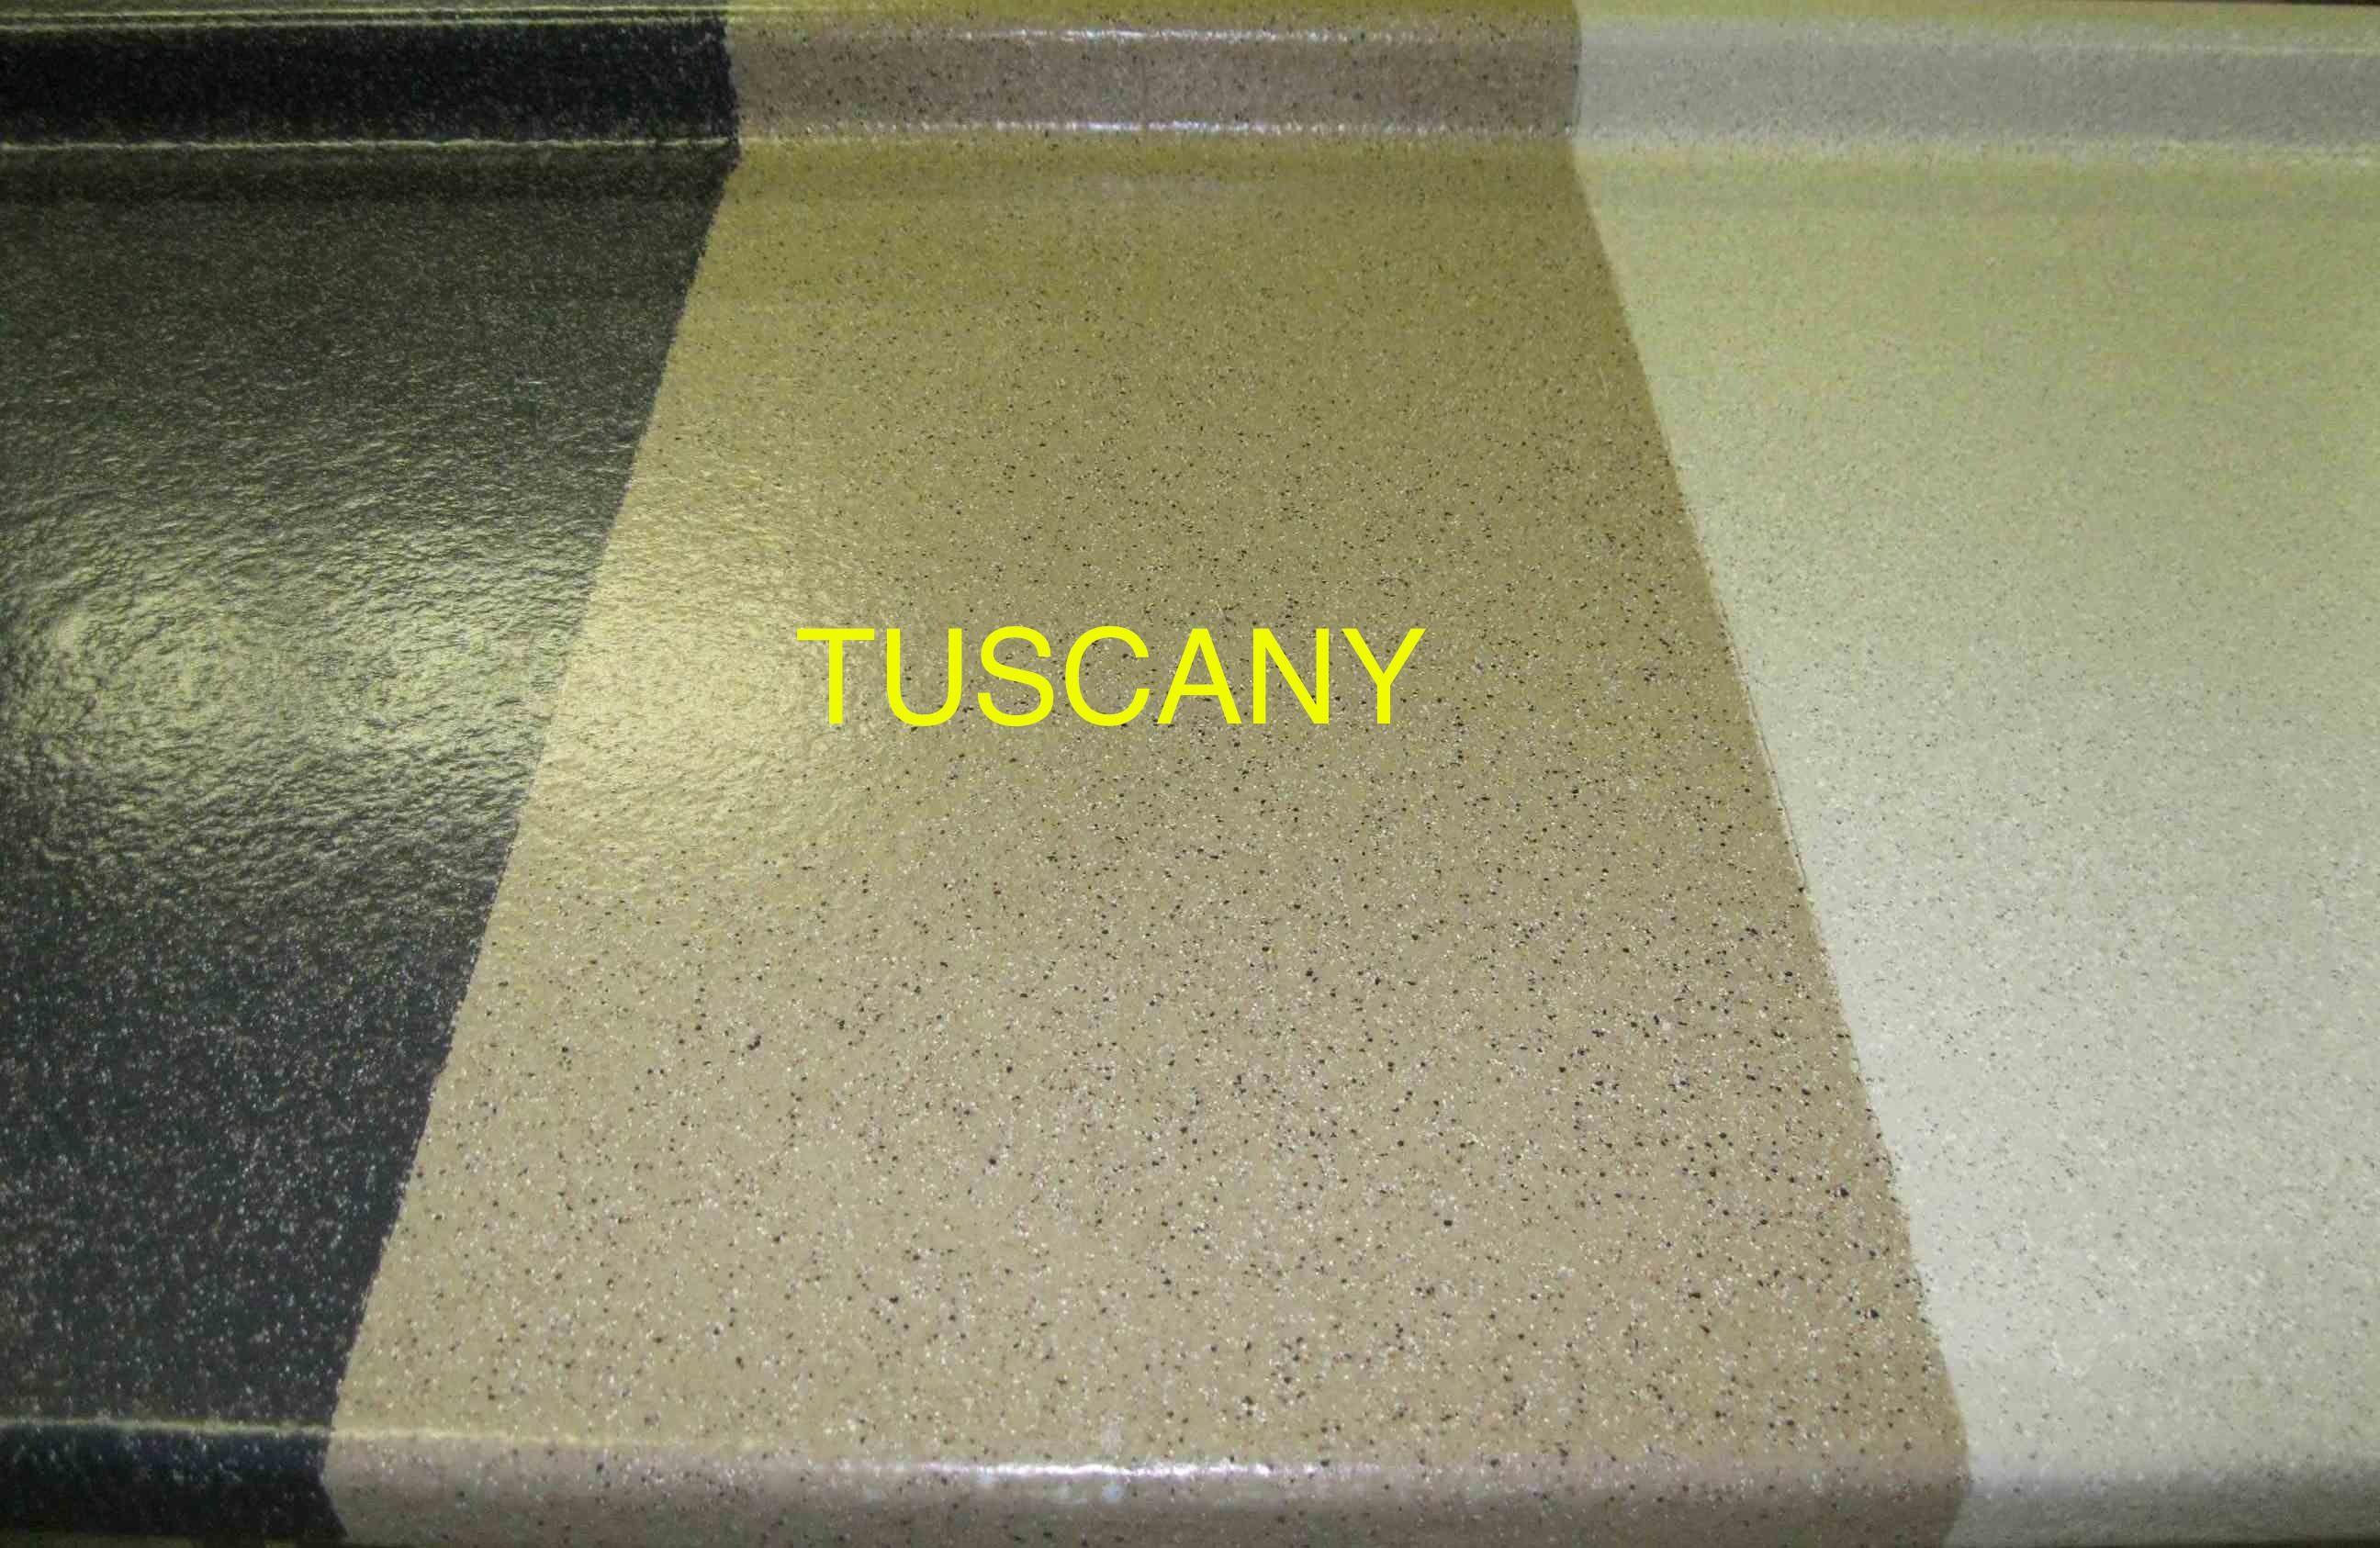 Dcfk Ty Spreadstone Countertop Finishing Kit Tuscany